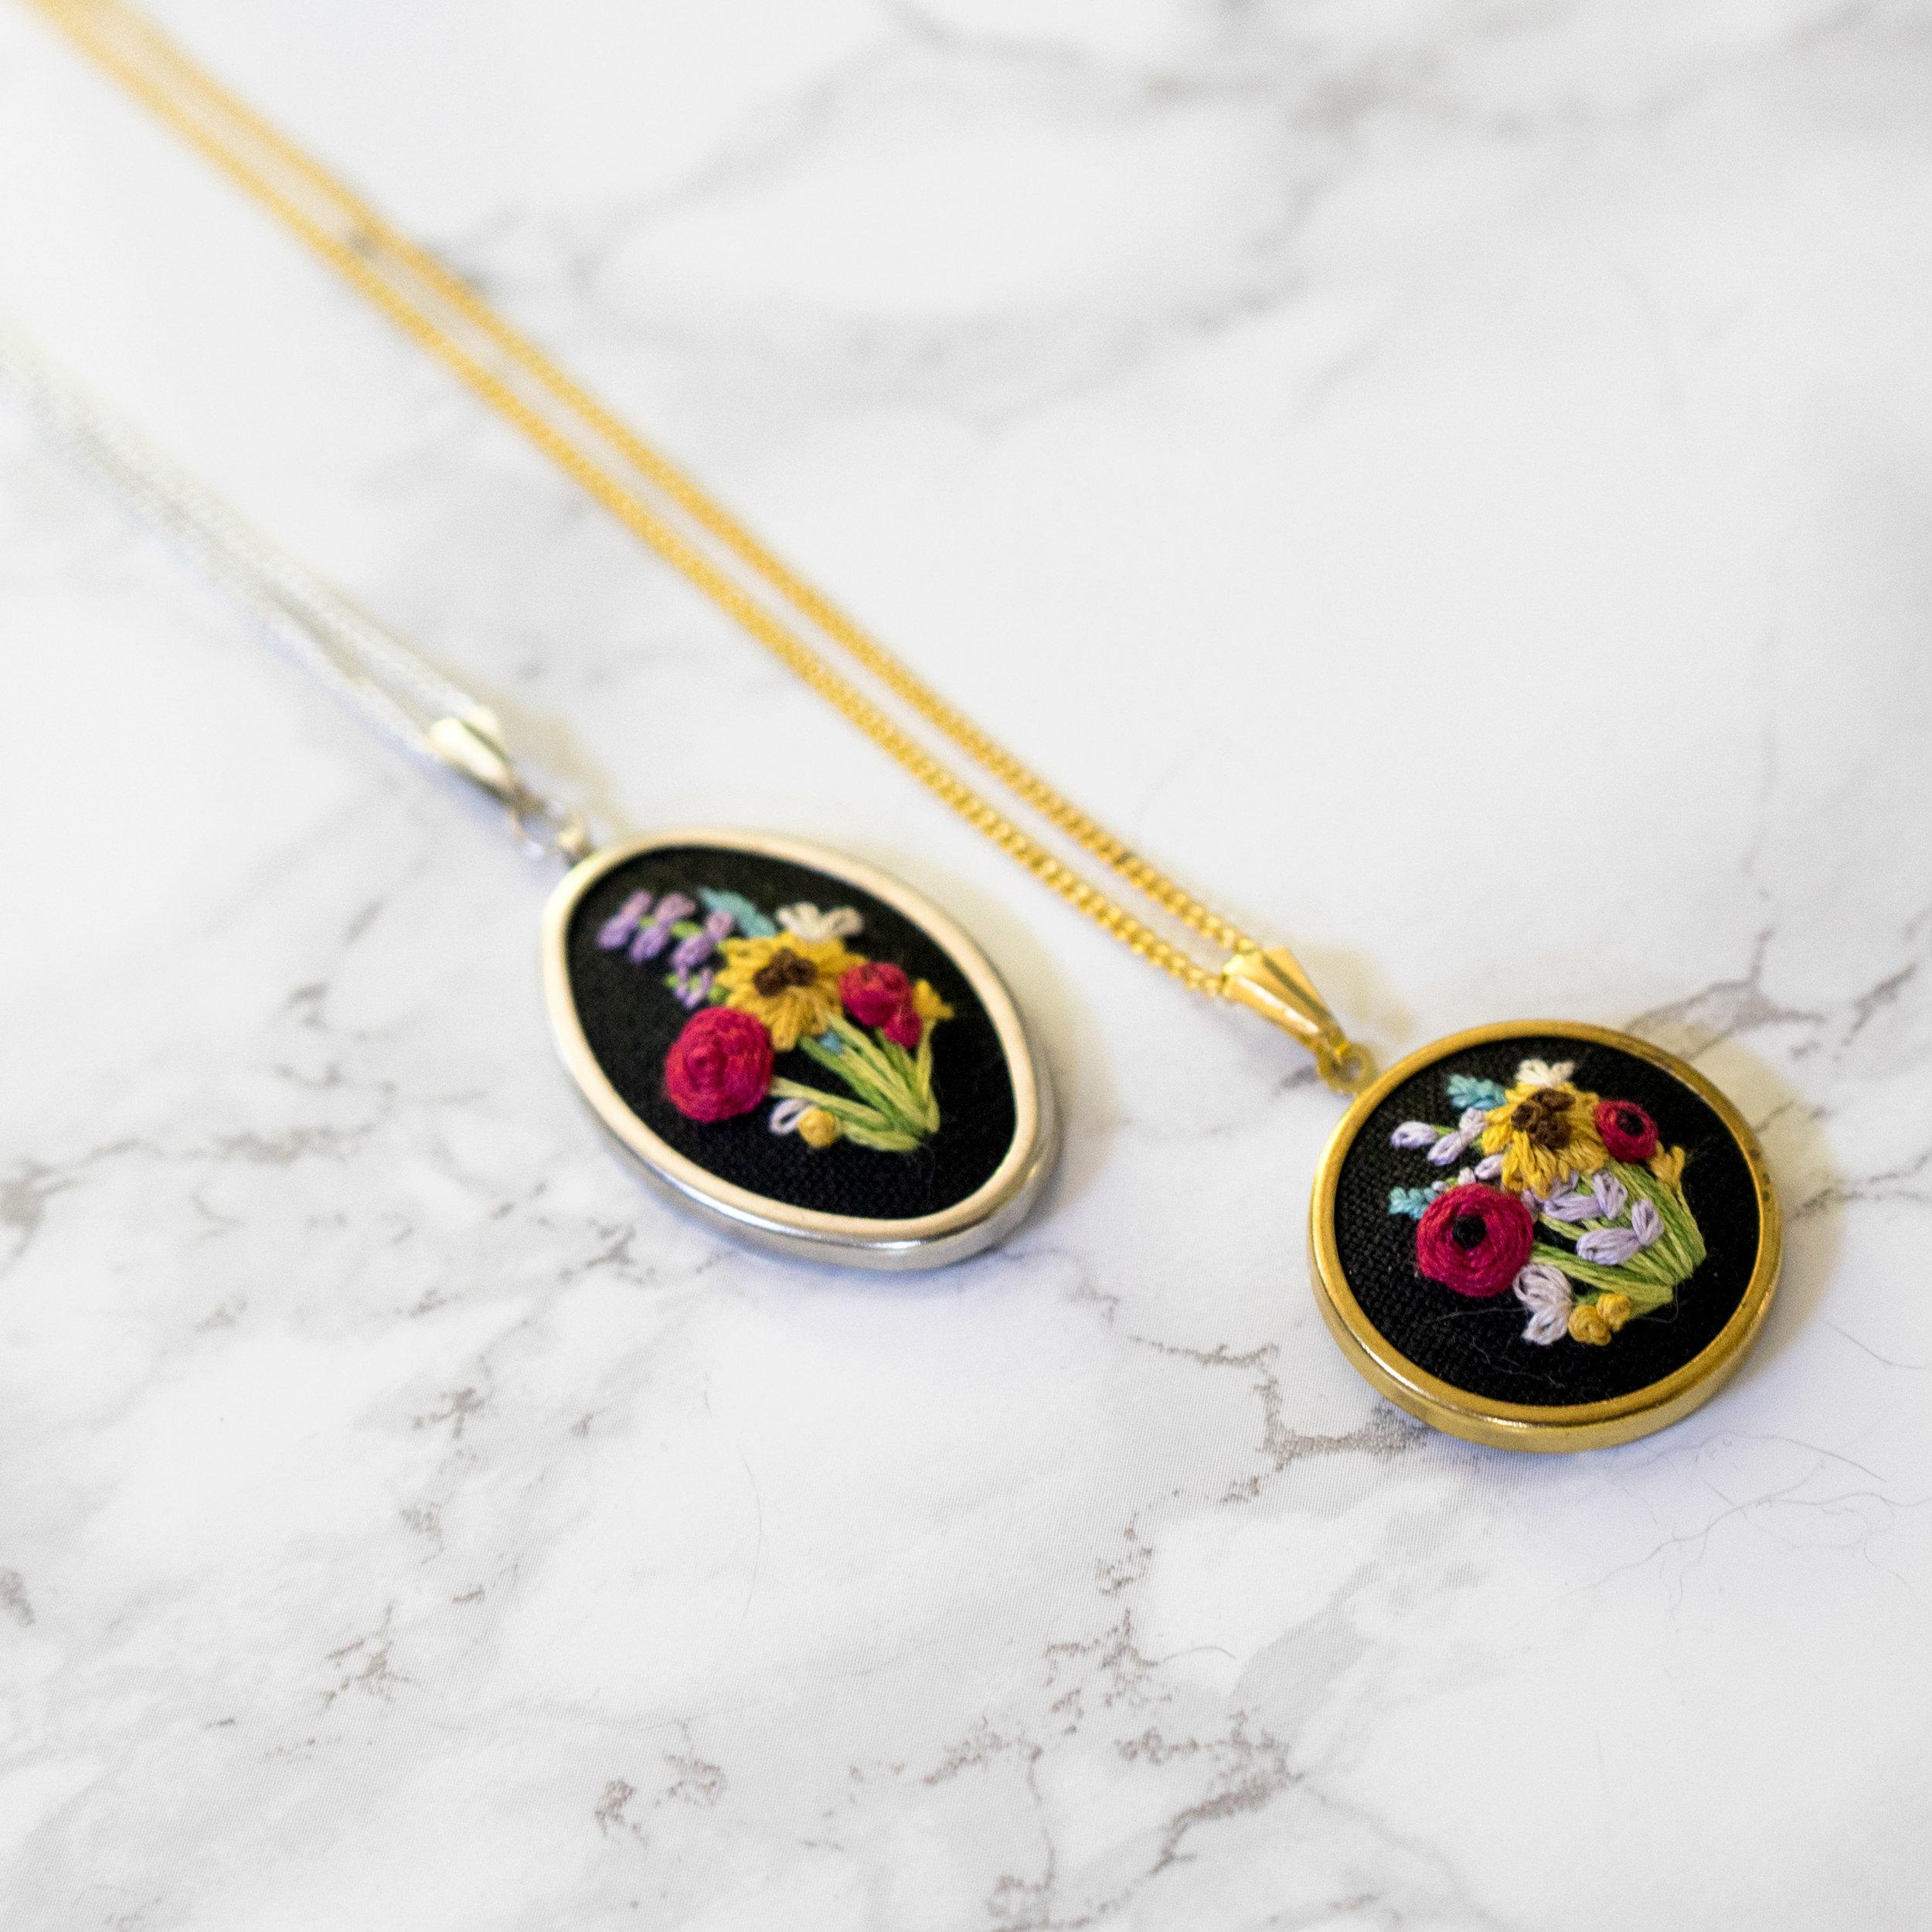 Necklace-5-IG.jpg